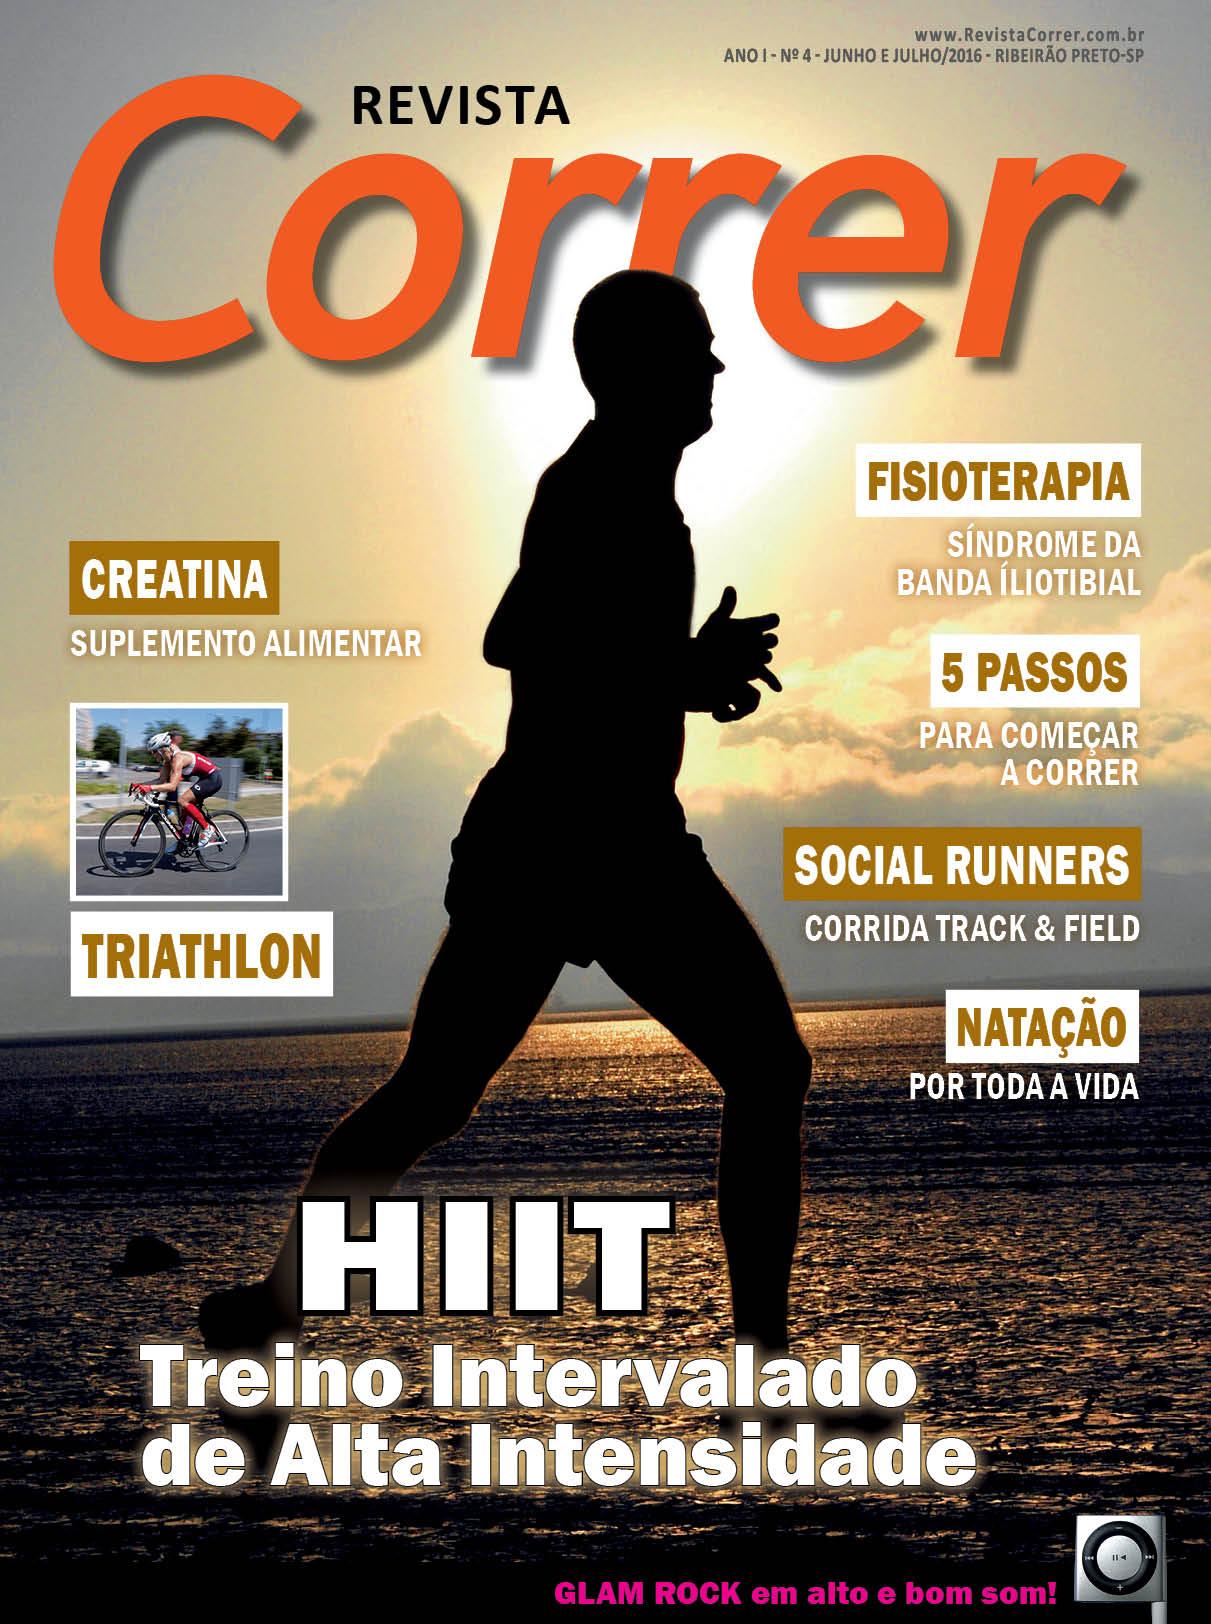 Corrida Revista Correr 4 Capa